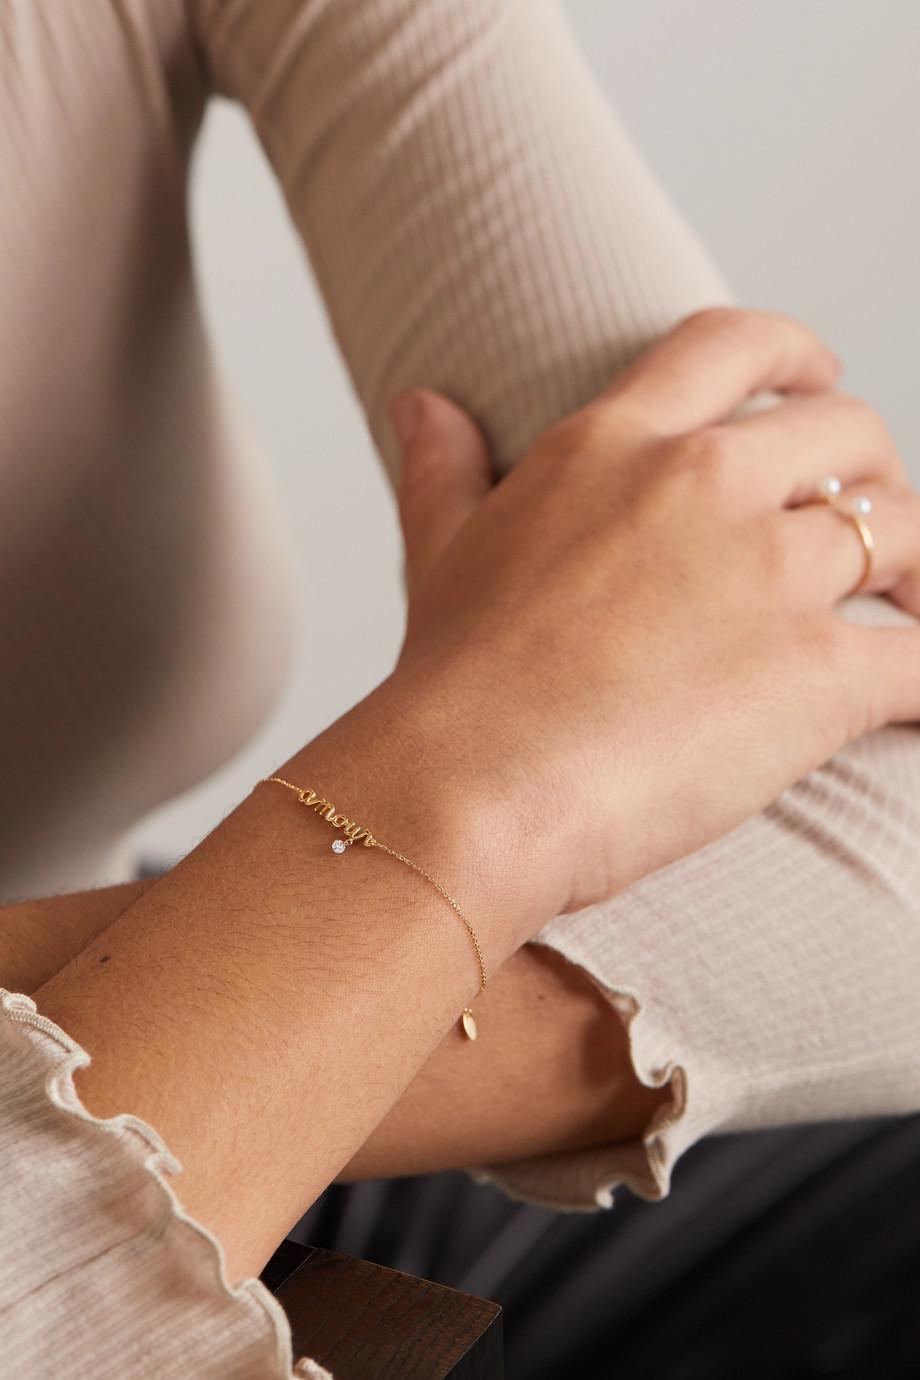 Persée Amour 18-karat gold diamond bracelet